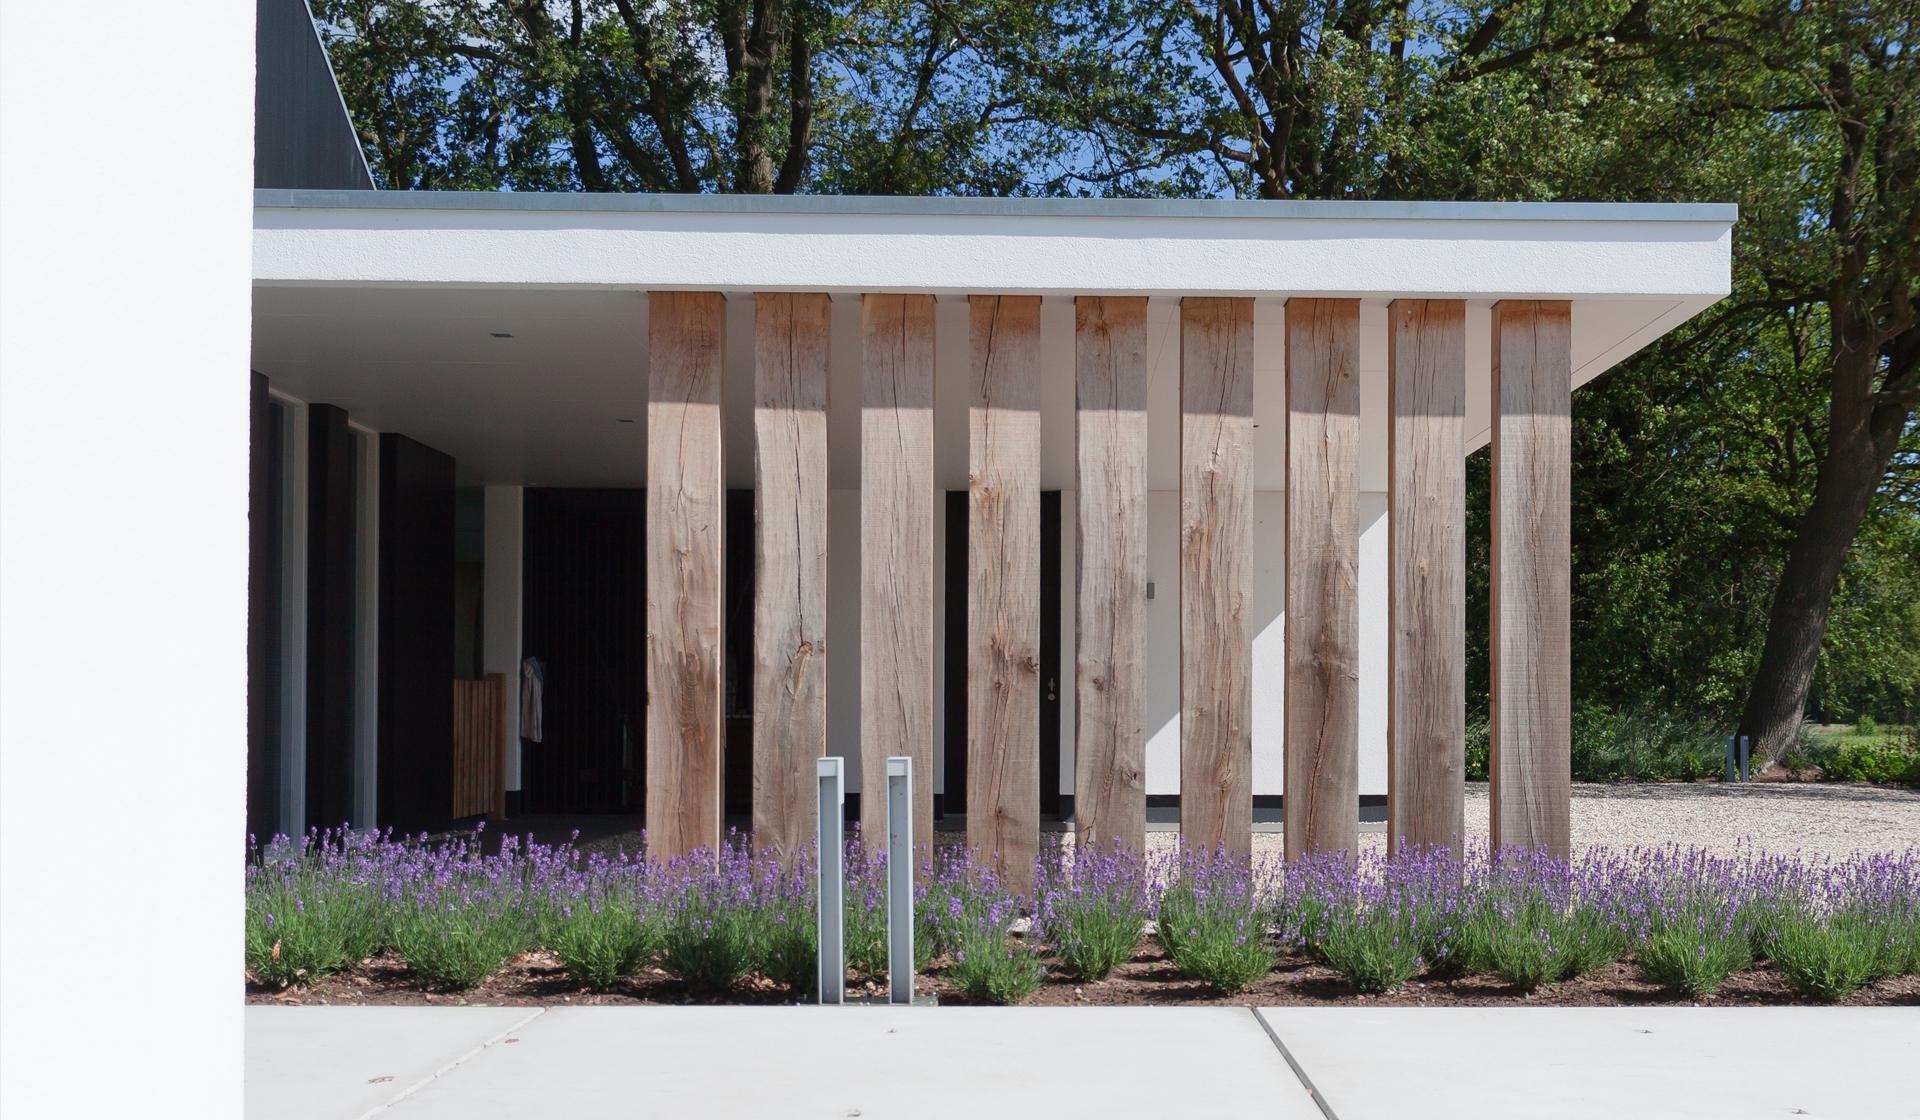 Strakke architectuur in traditionele materialsiering